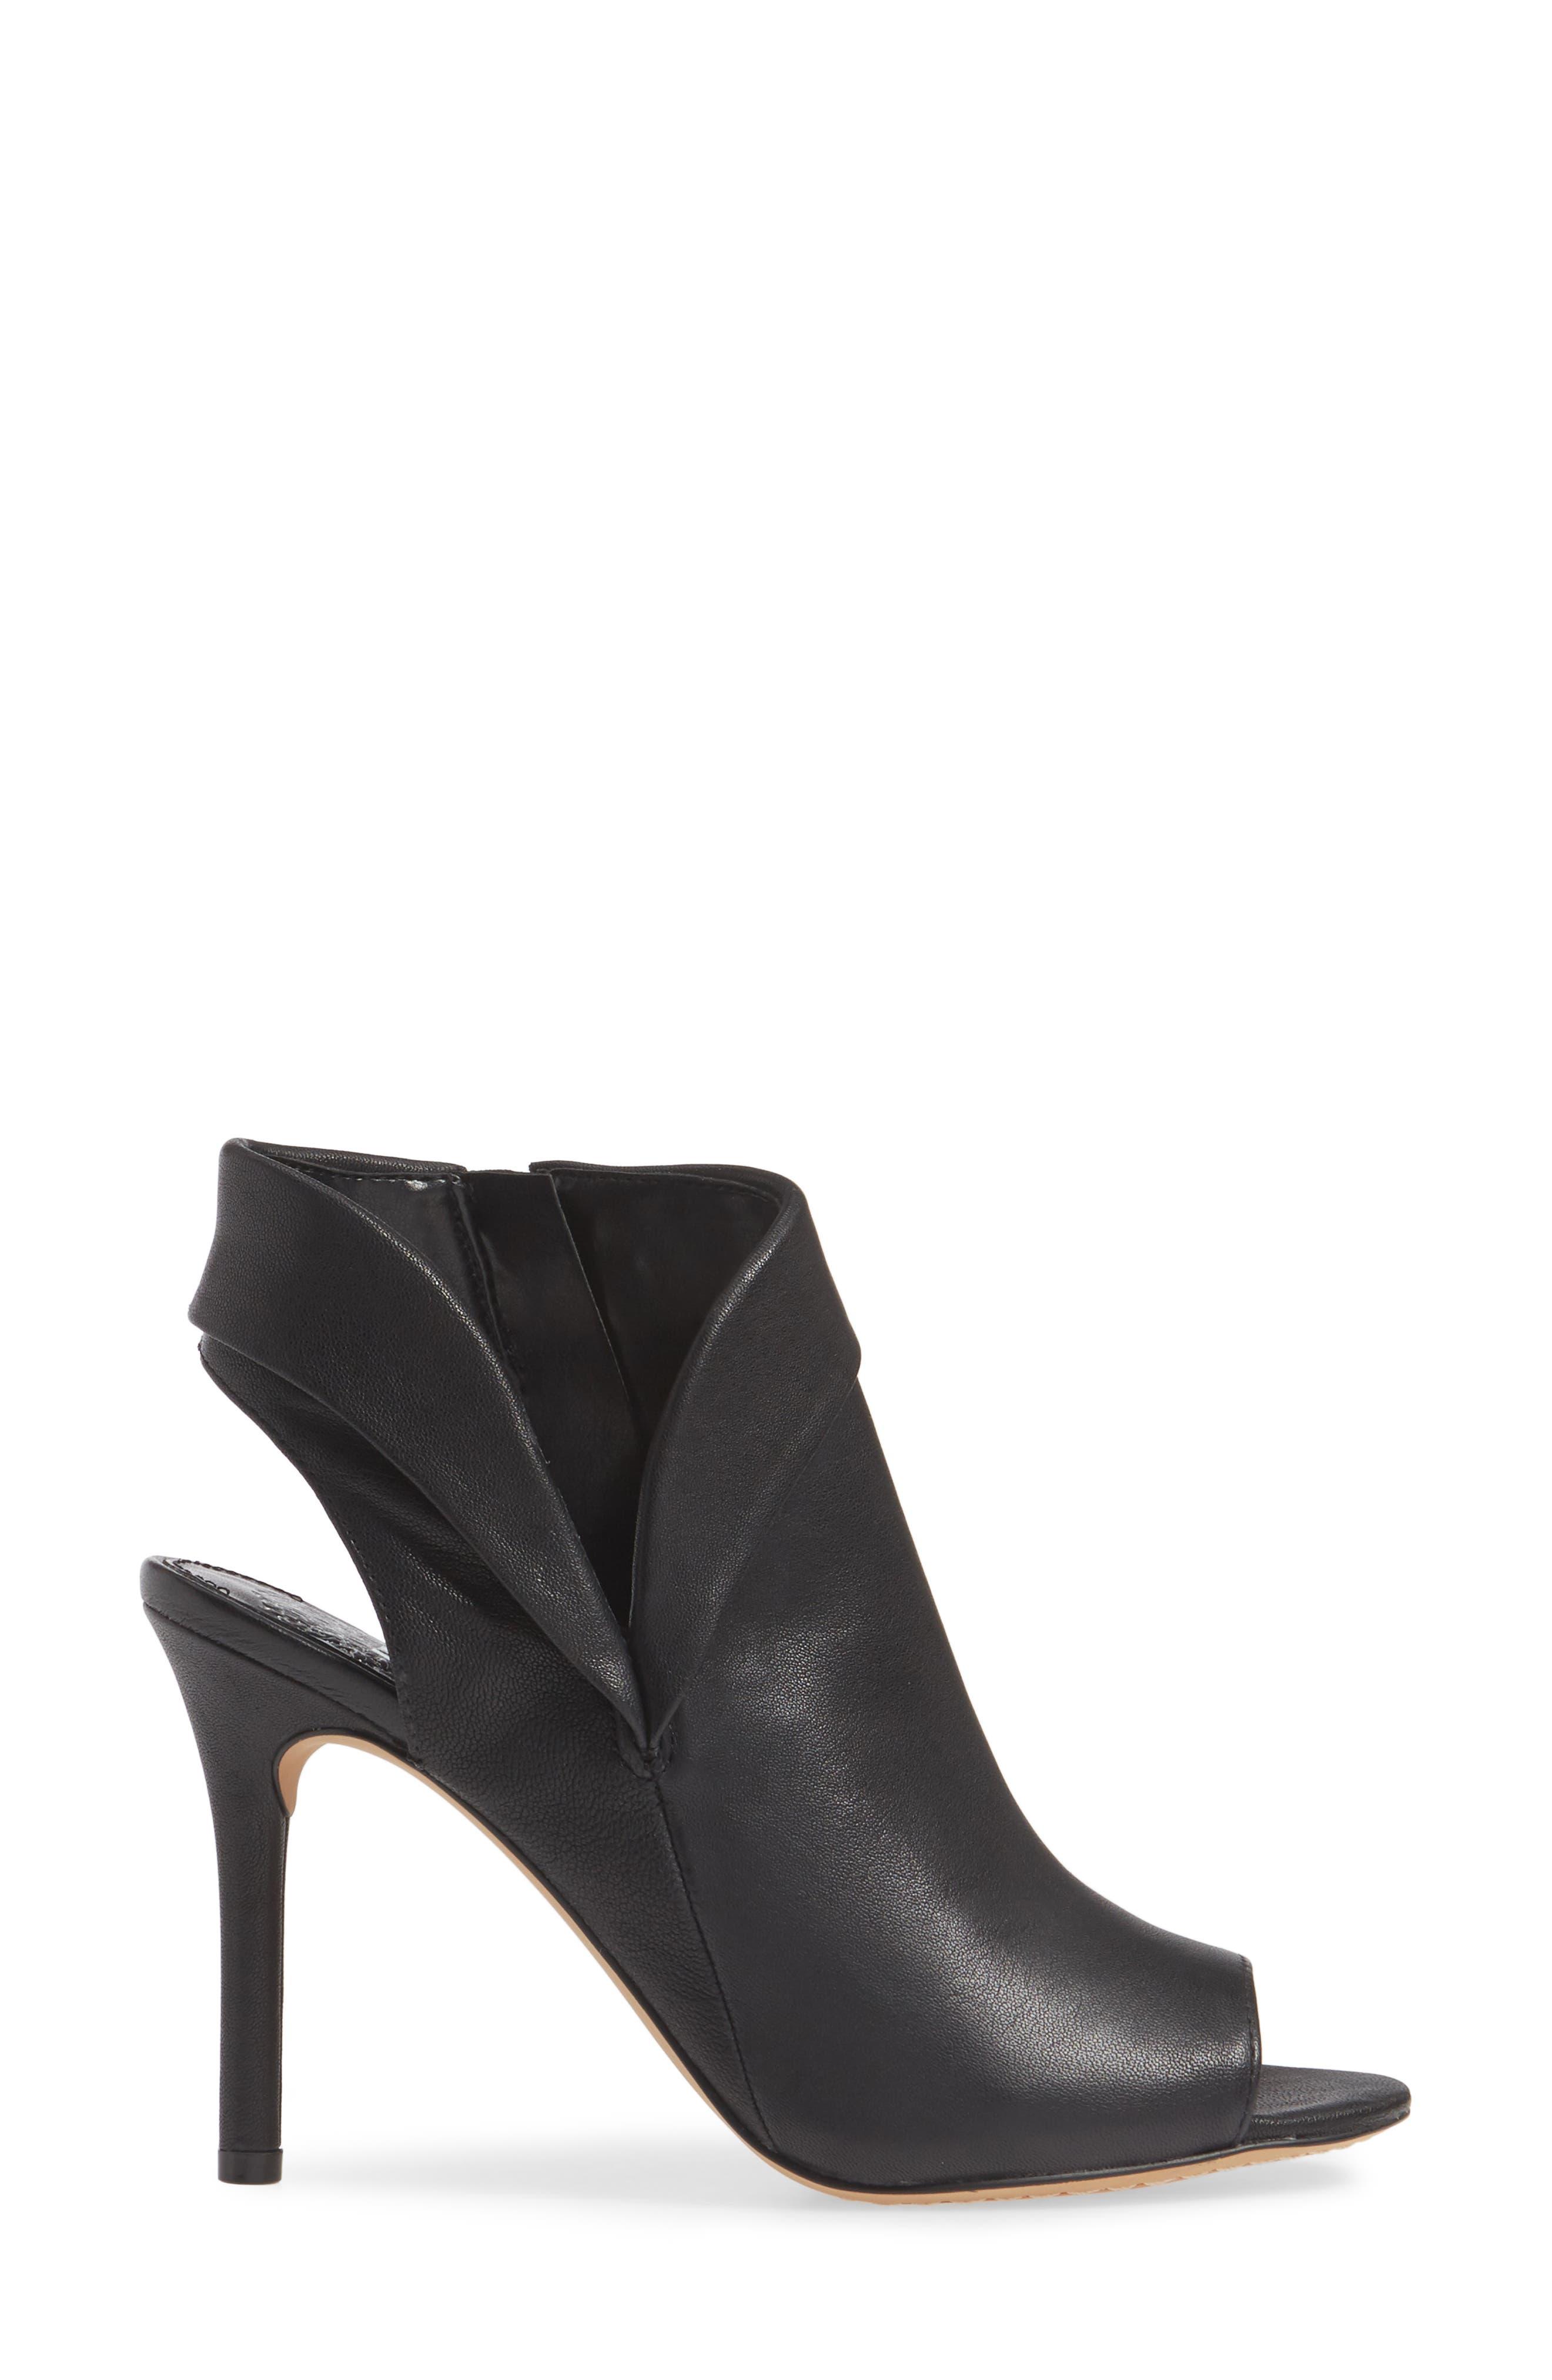 Cholia Asymmetrical Sandal Bootie,                             Alternate thumbnail 3, color,                             BLACK LEATHER